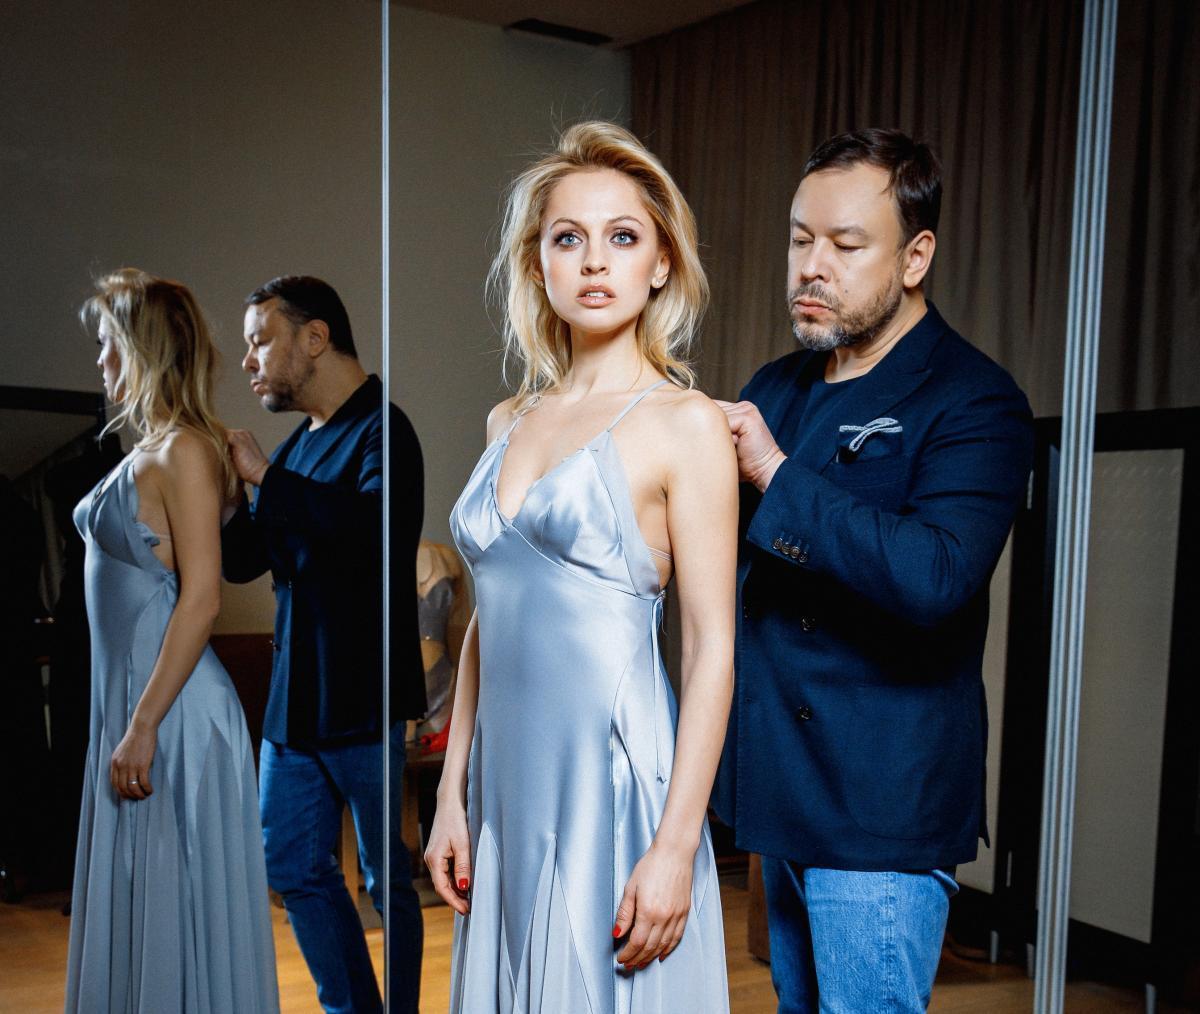 Игорь Чапурин создаст образы артистов шоу «Танцы со звездами»